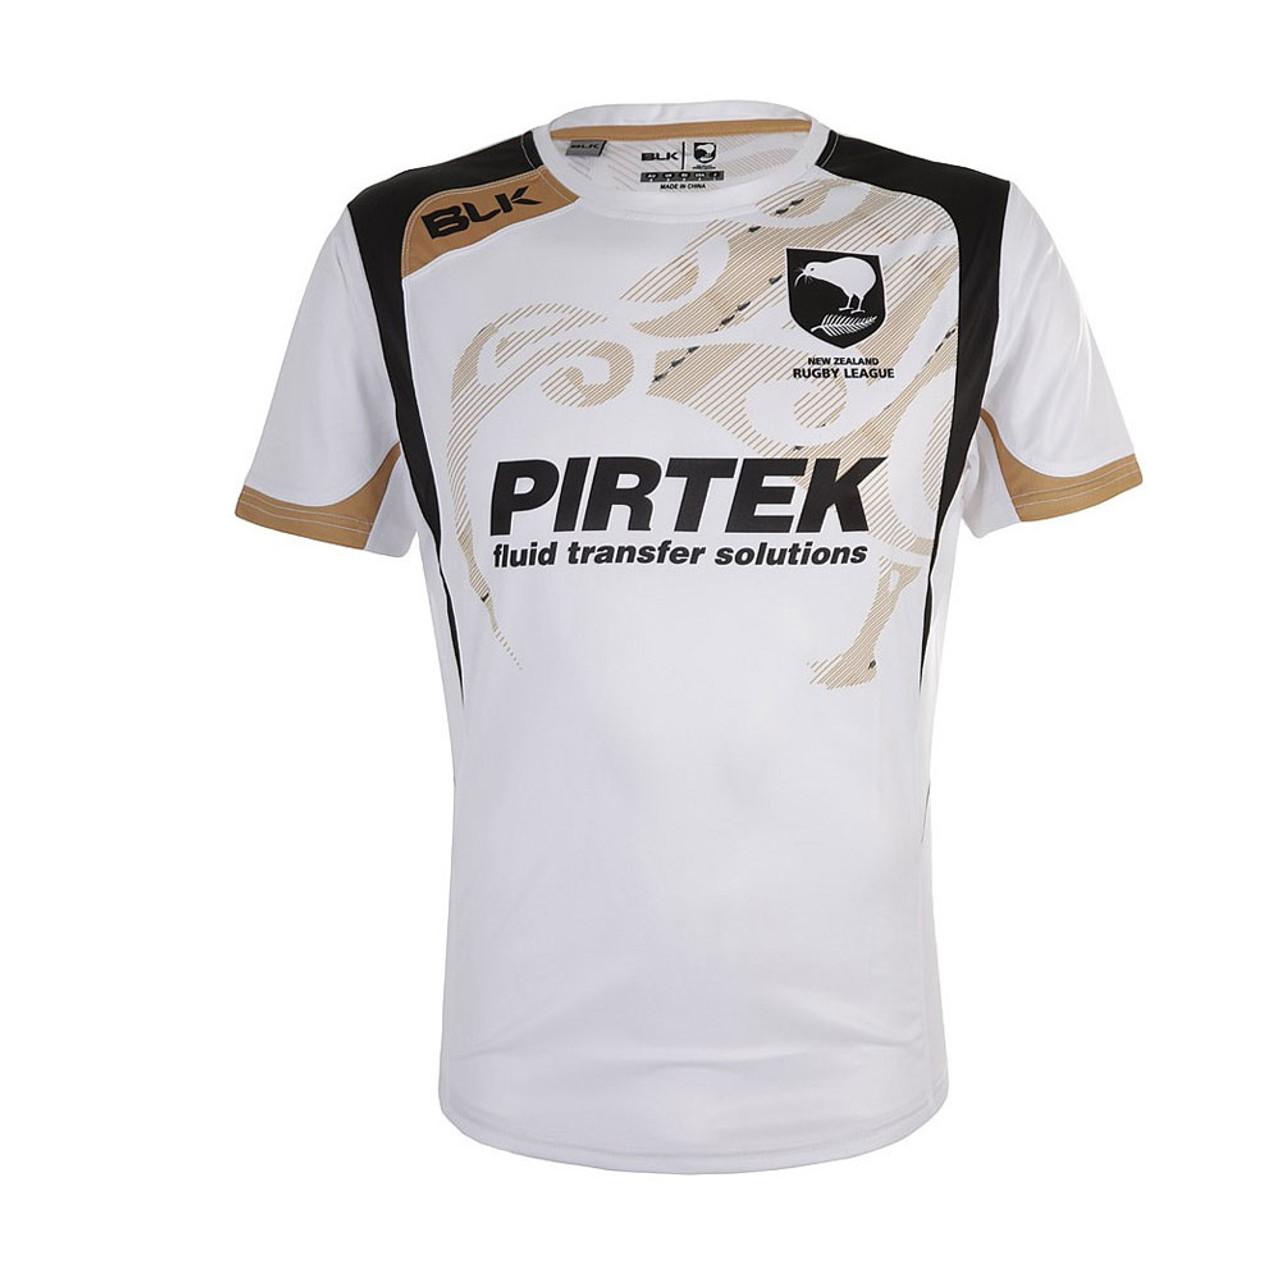 BLK new zealand kiwis rugby league training t-shirt [white]